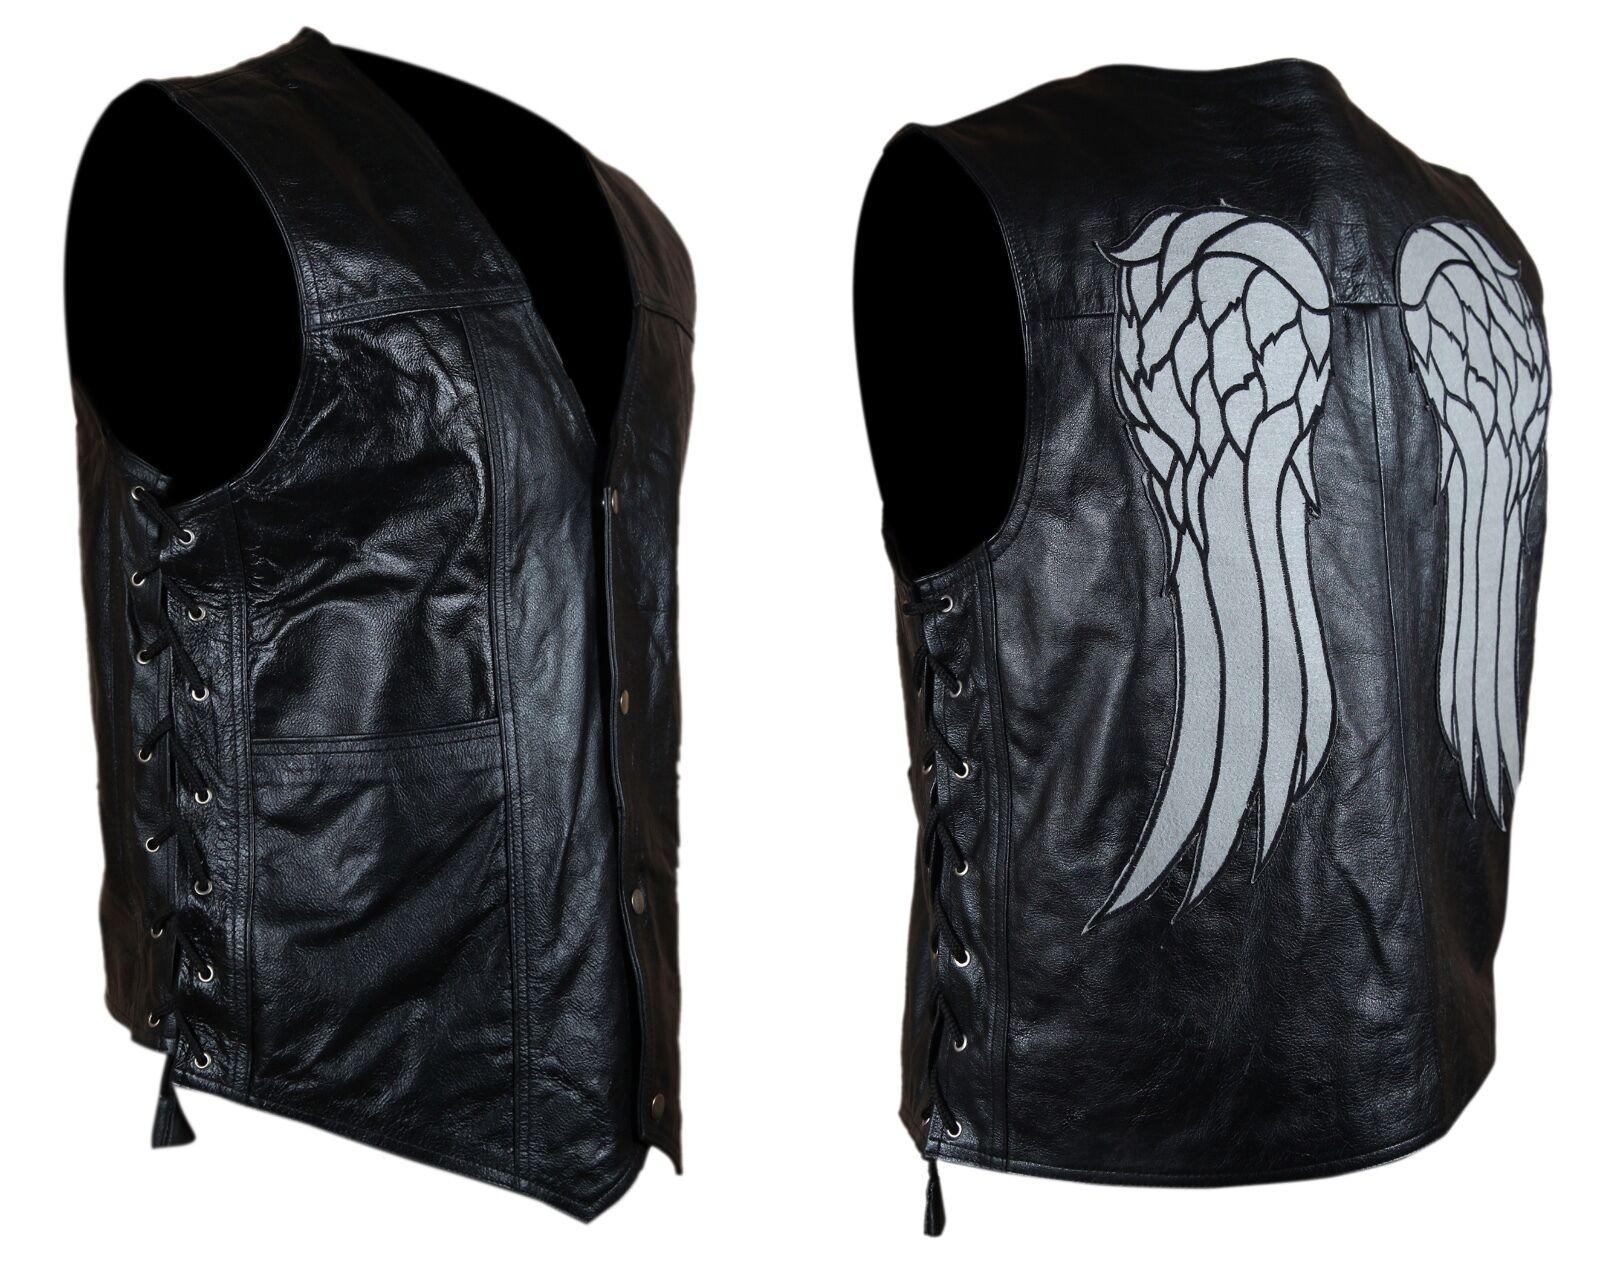 BNWT HQ Daryl Dixon Norman Reedus The Walking Dead Grade A Leder or Faux Vest